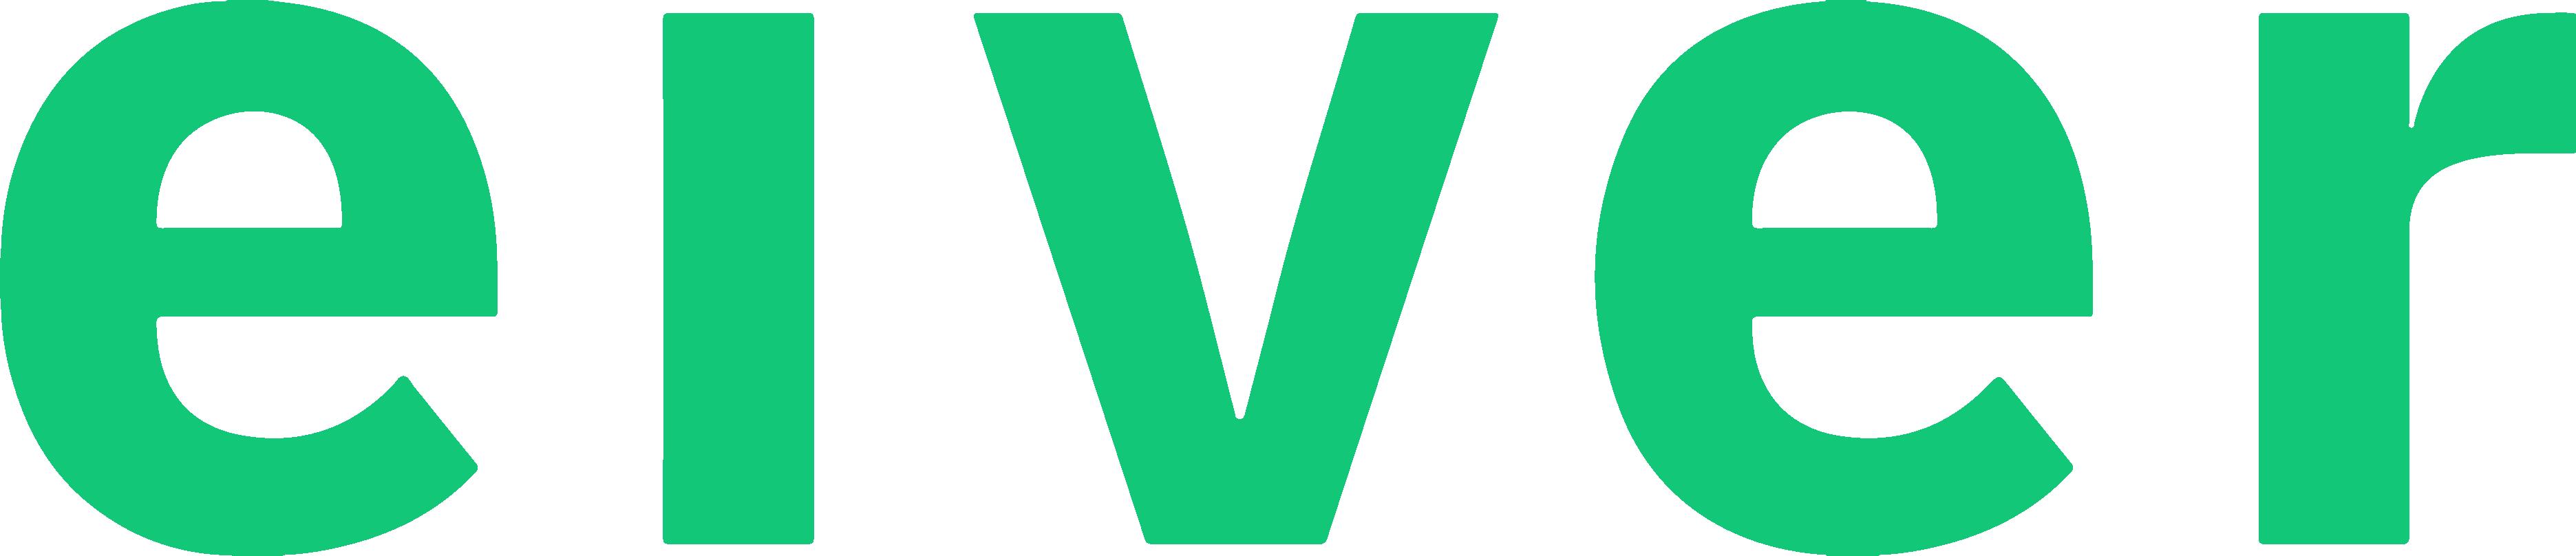 Logo Eiver - Partenaire Cocolis